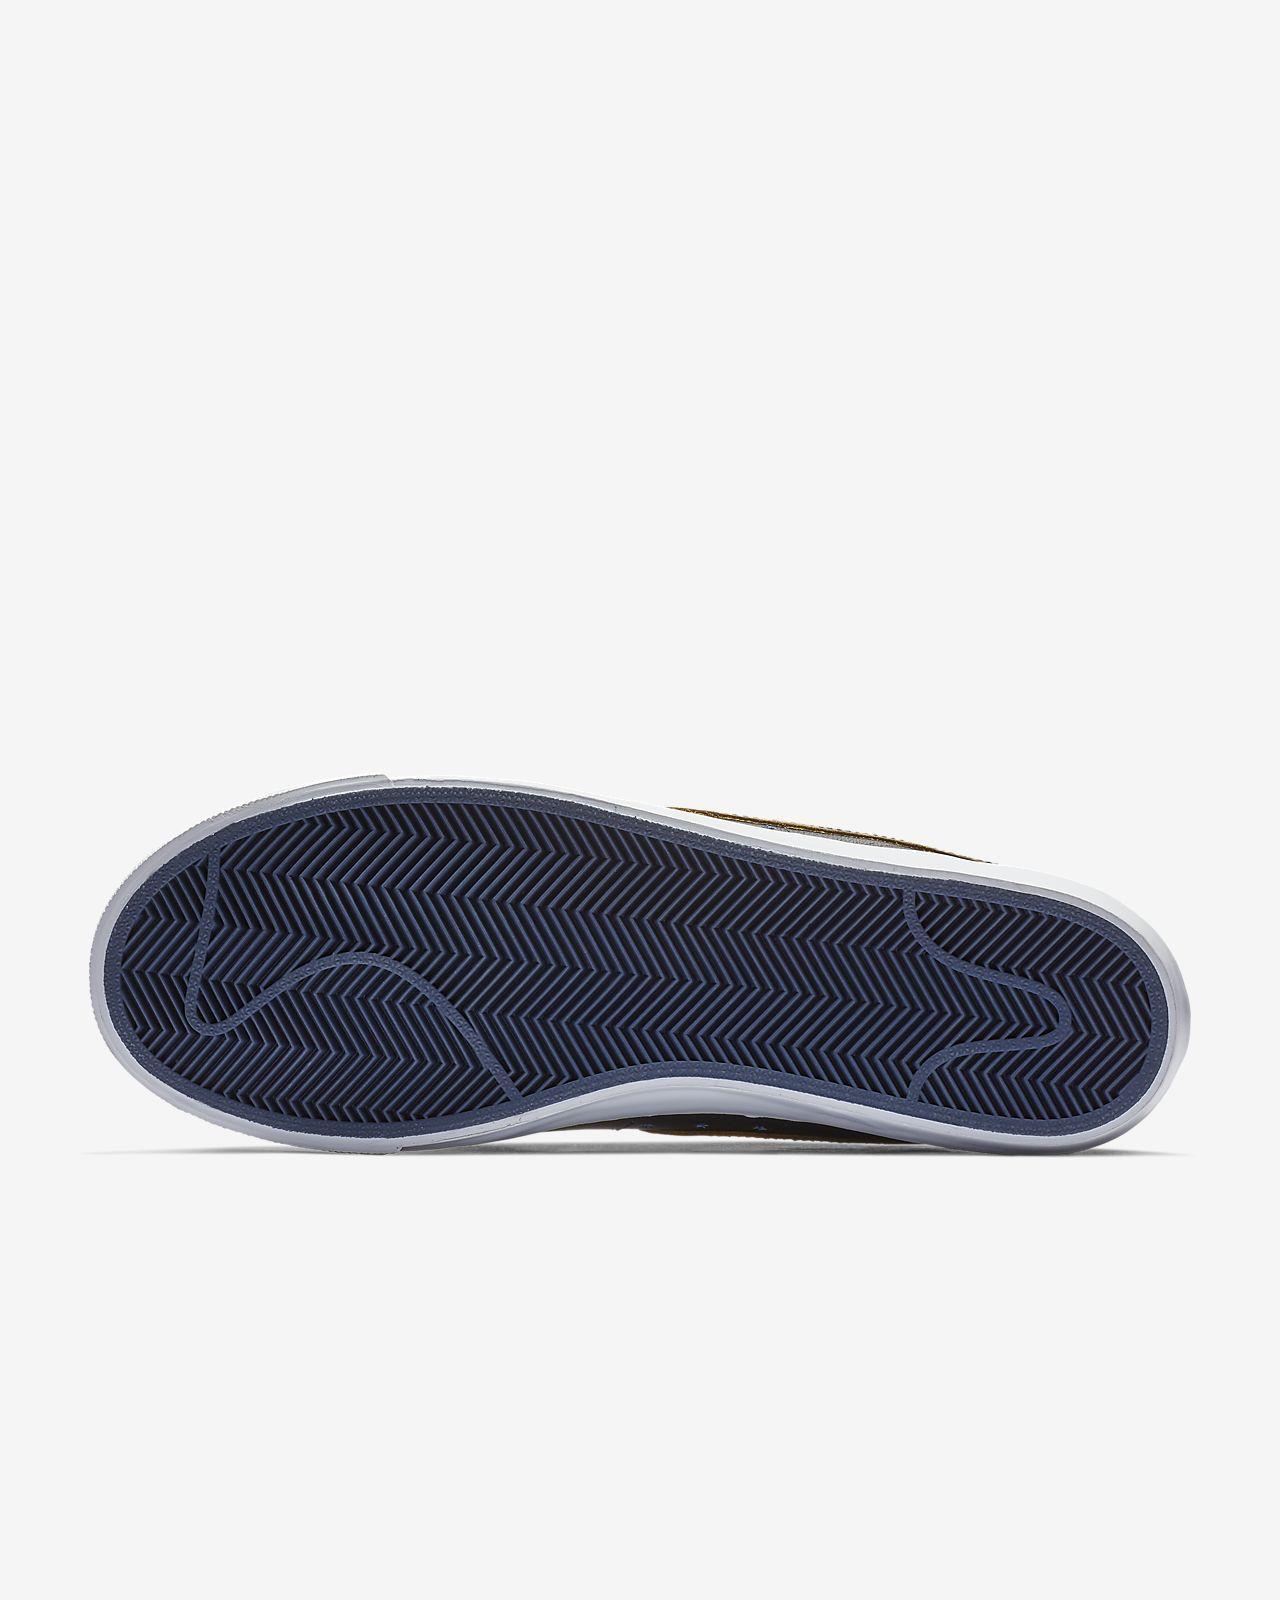 2618d43f7a854 Nike SB Blazer Low GT NBA Men s Skate Shoe. Nike.com GB